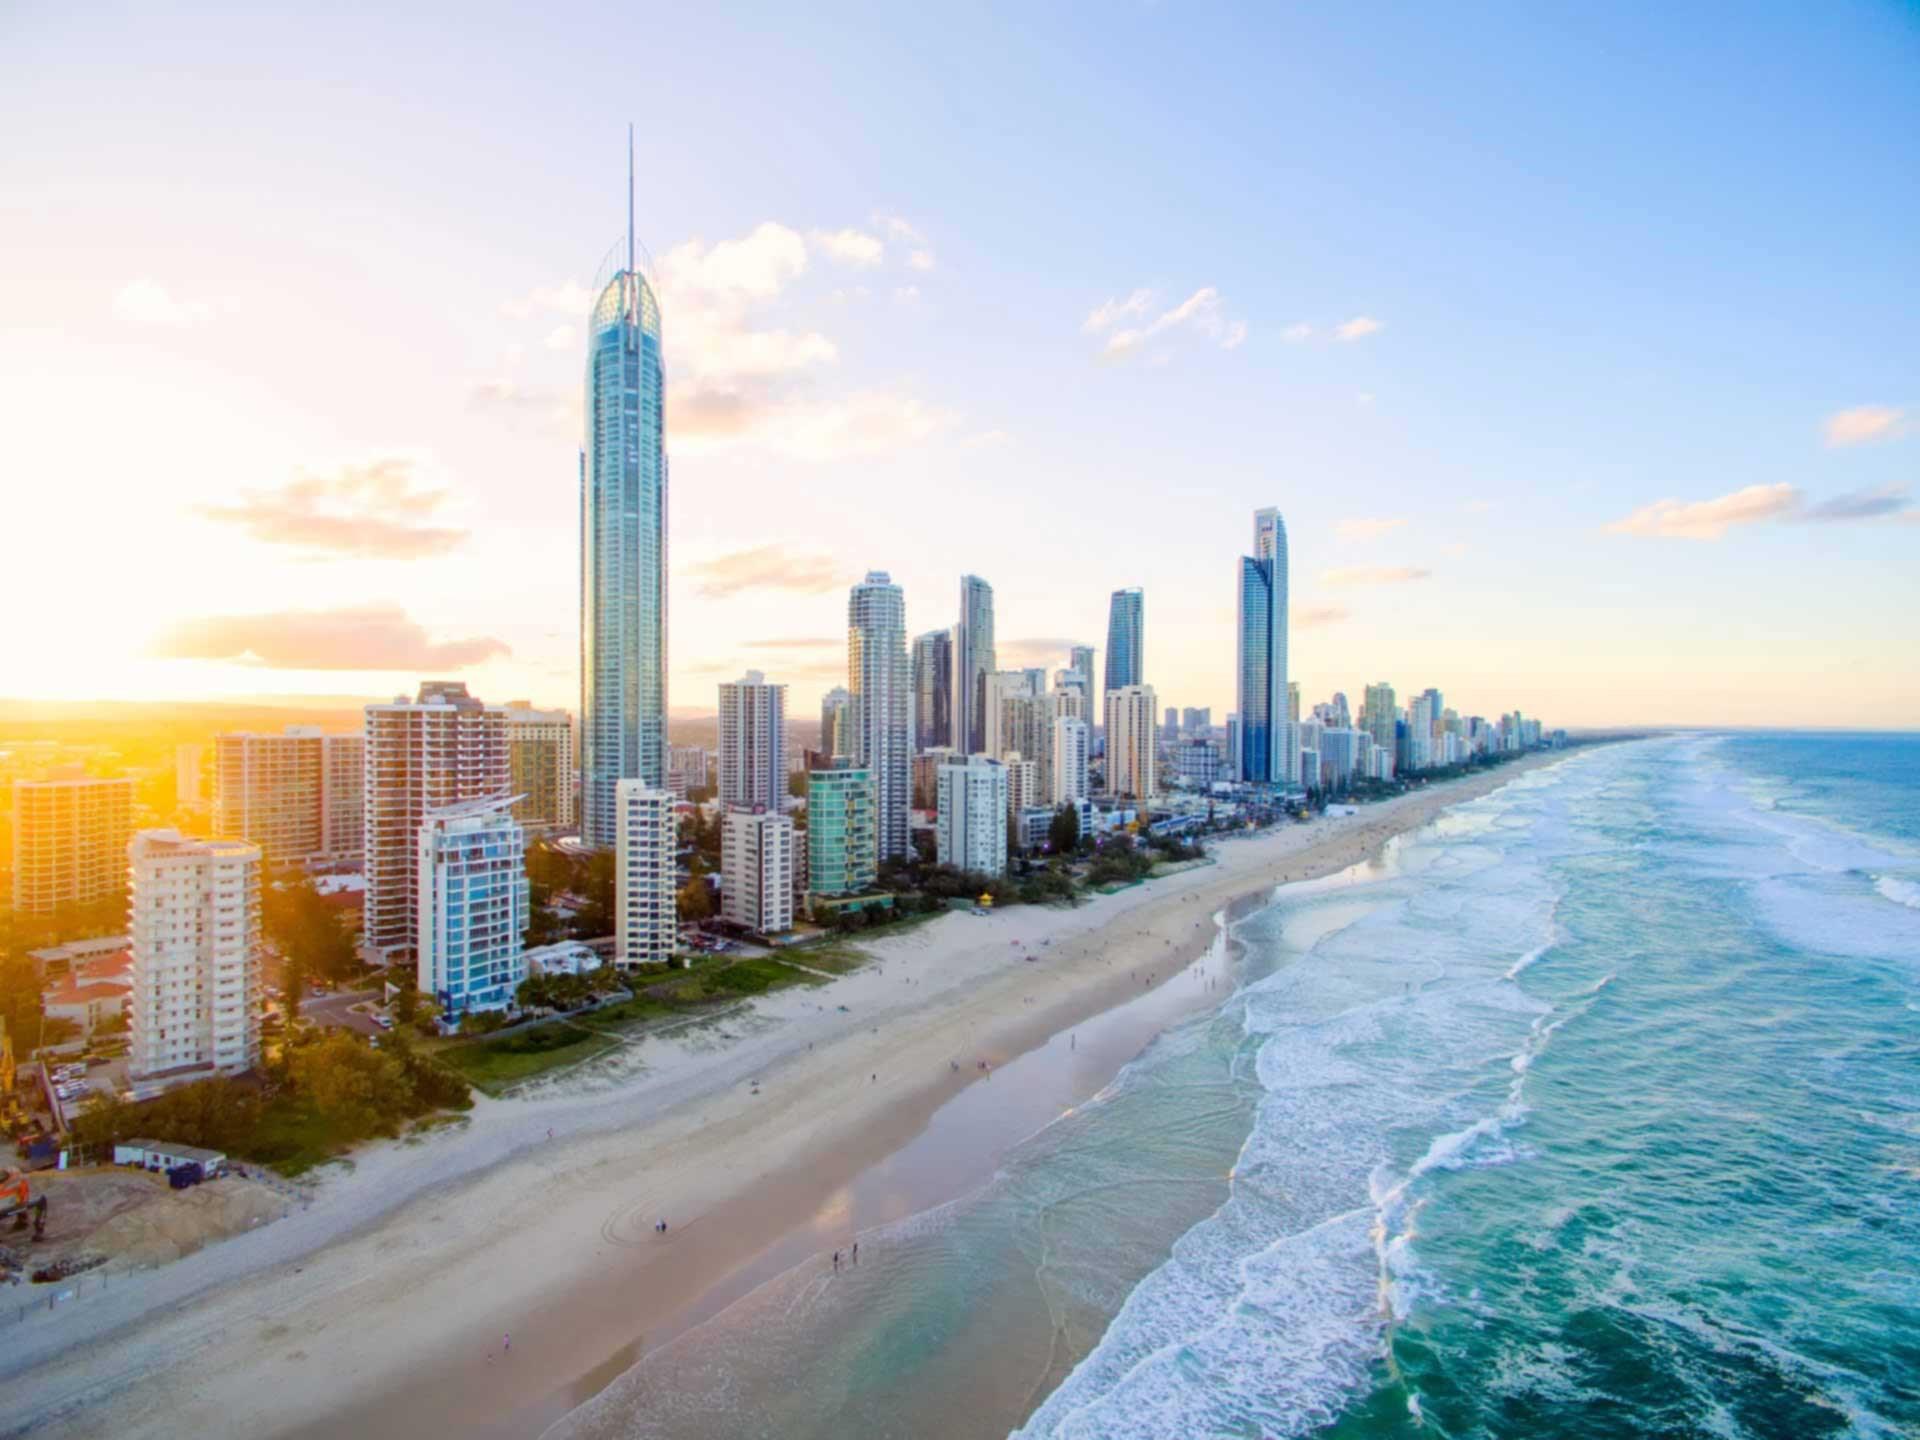 The Gold Coast Skyline from yesterdays sunrise : australia